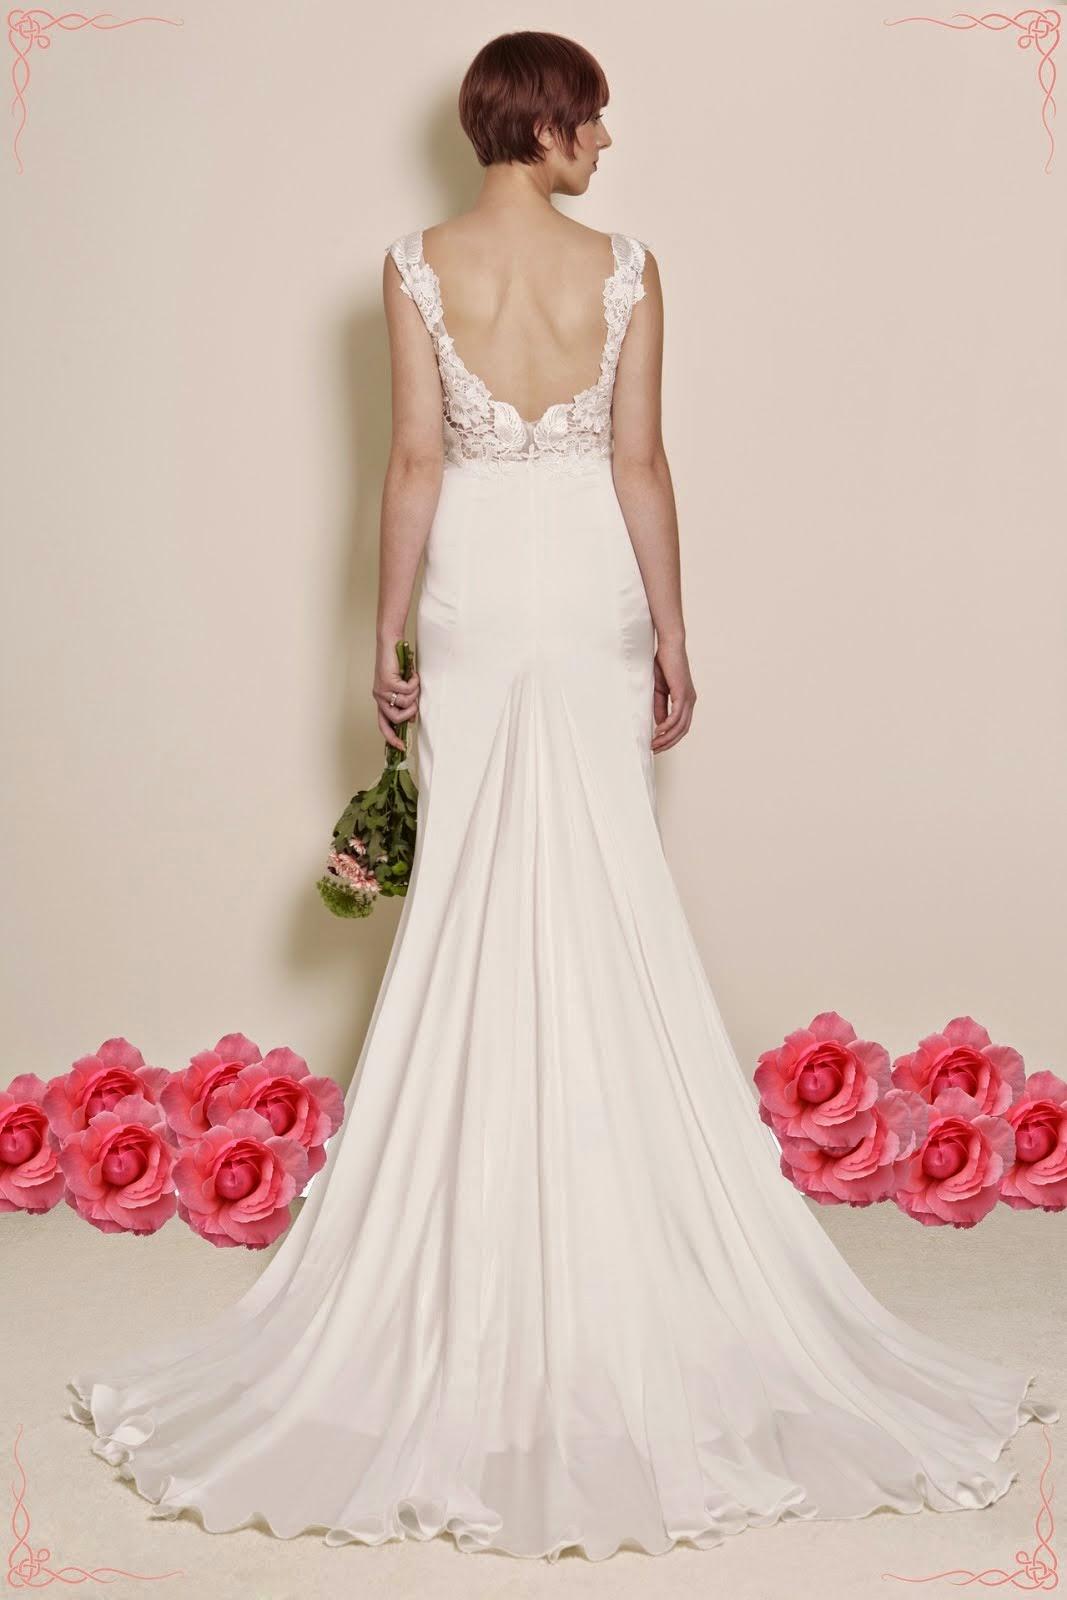 Estilo Moda 2014 Grace & Lace Wedding Dress Collection